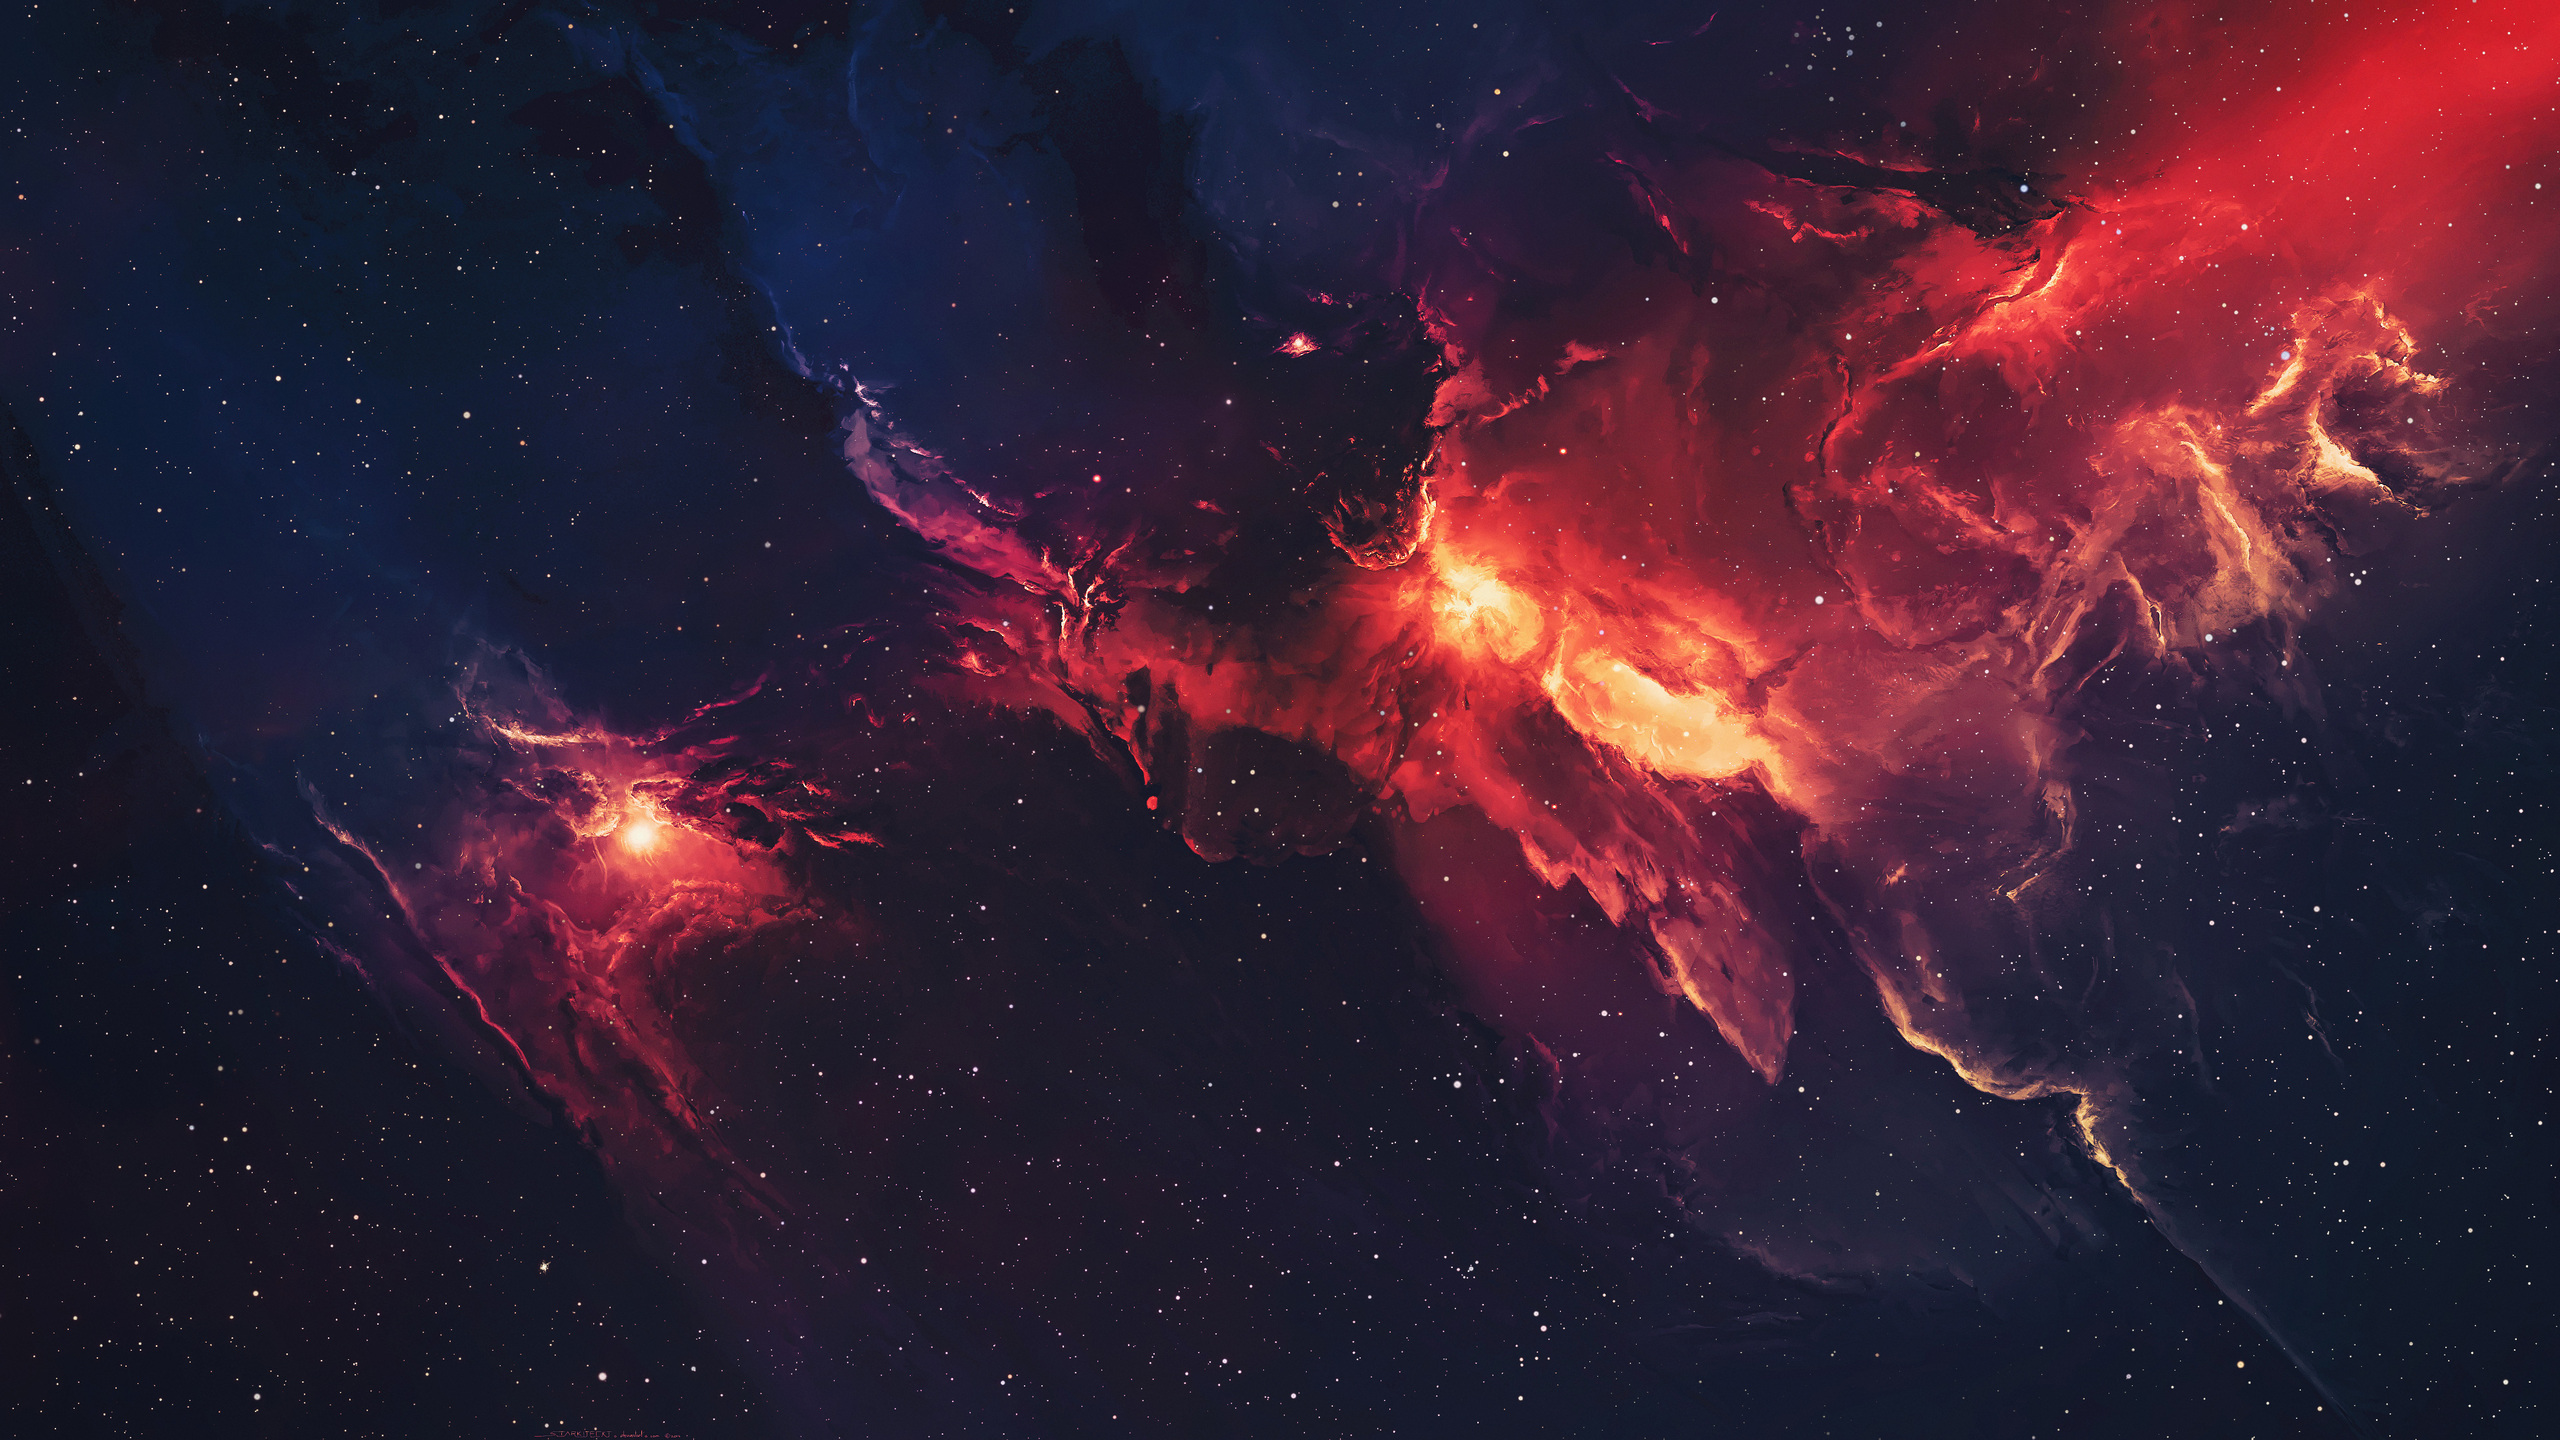 2560x1440 galaxy space stars universe nebula 4k 1440p - 4k resolution space wallpaper ...